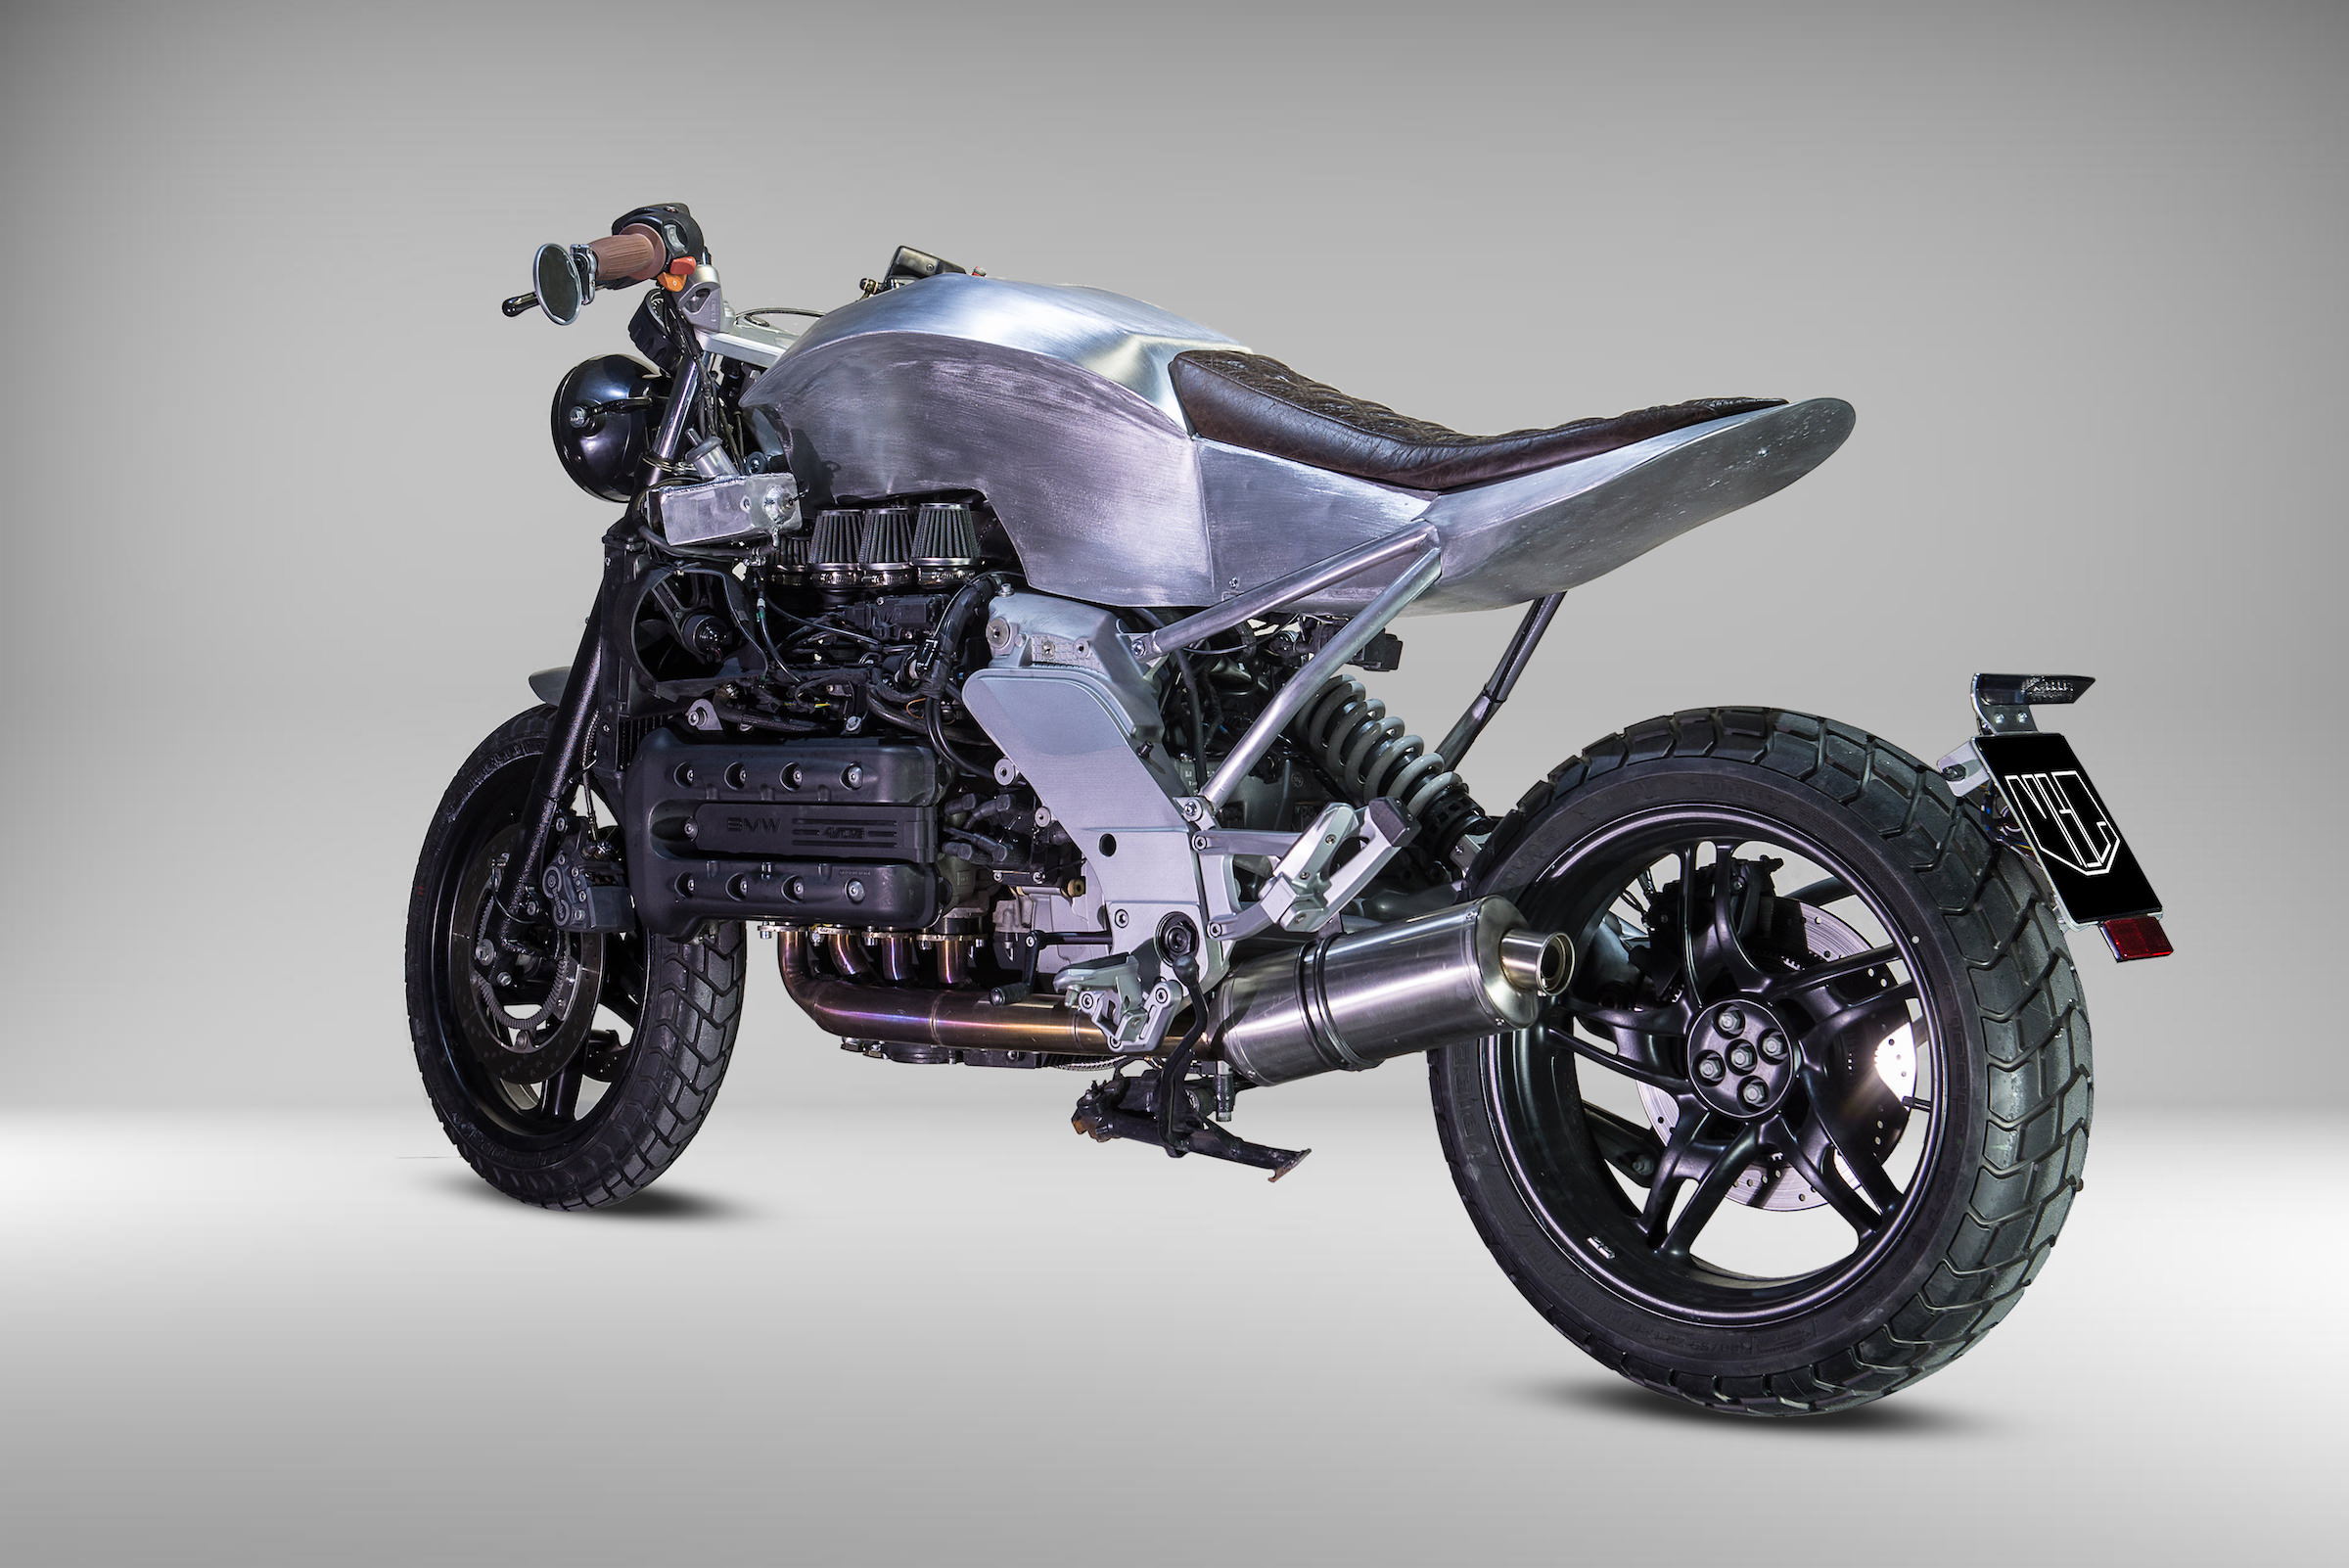 The Metalbike Garage Custom BMW K1200RS